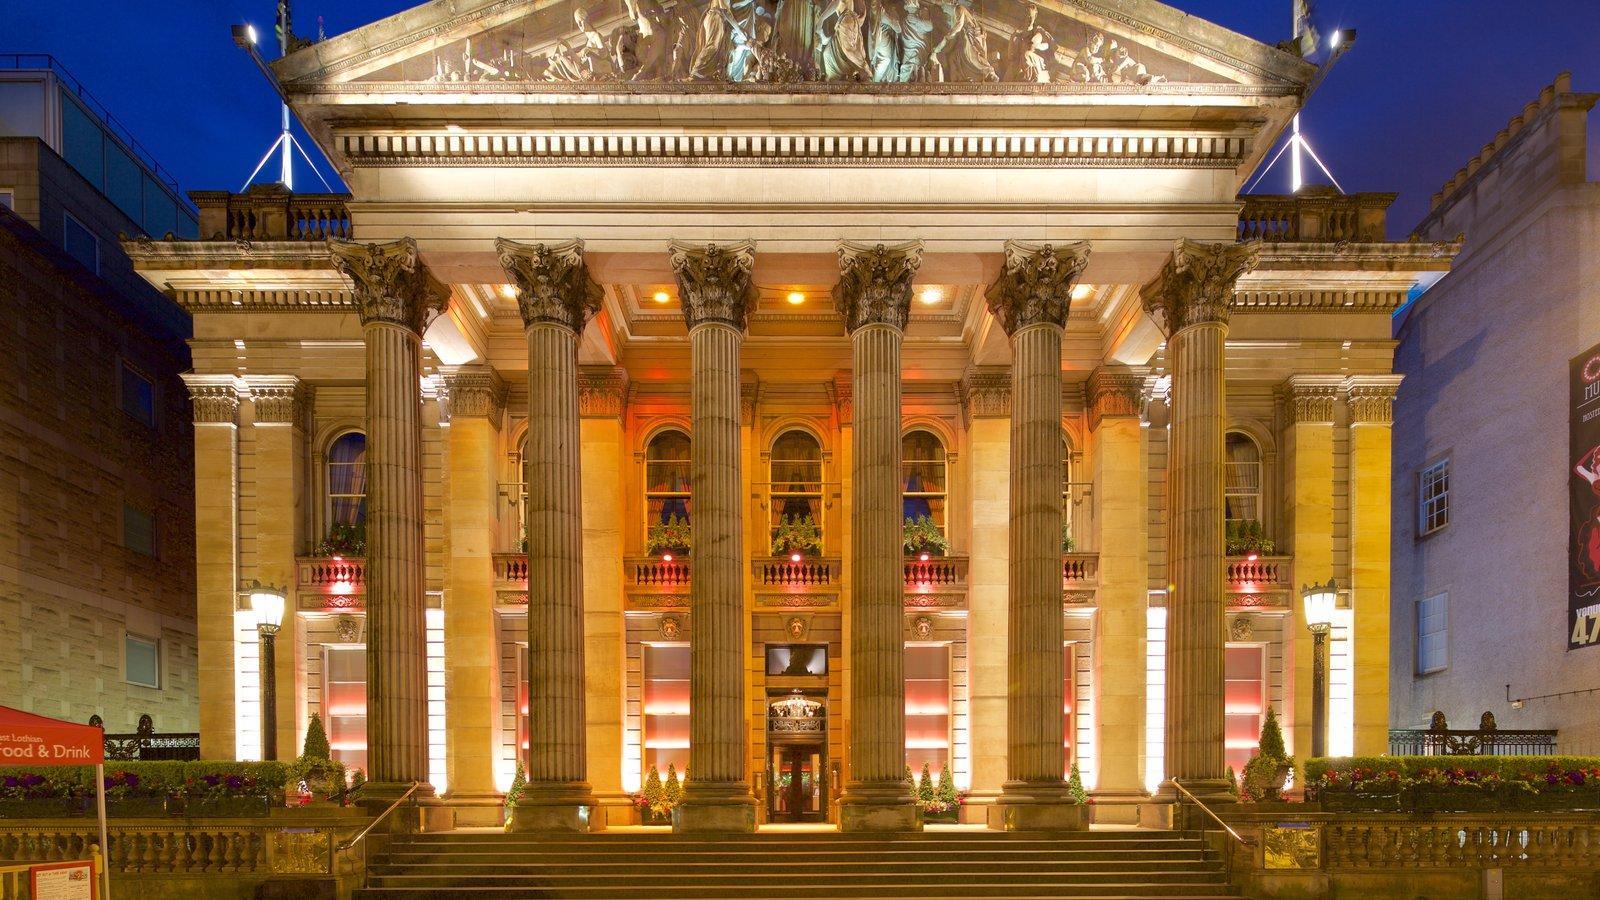 Edinburgh featuring night scenes and heritage architecture